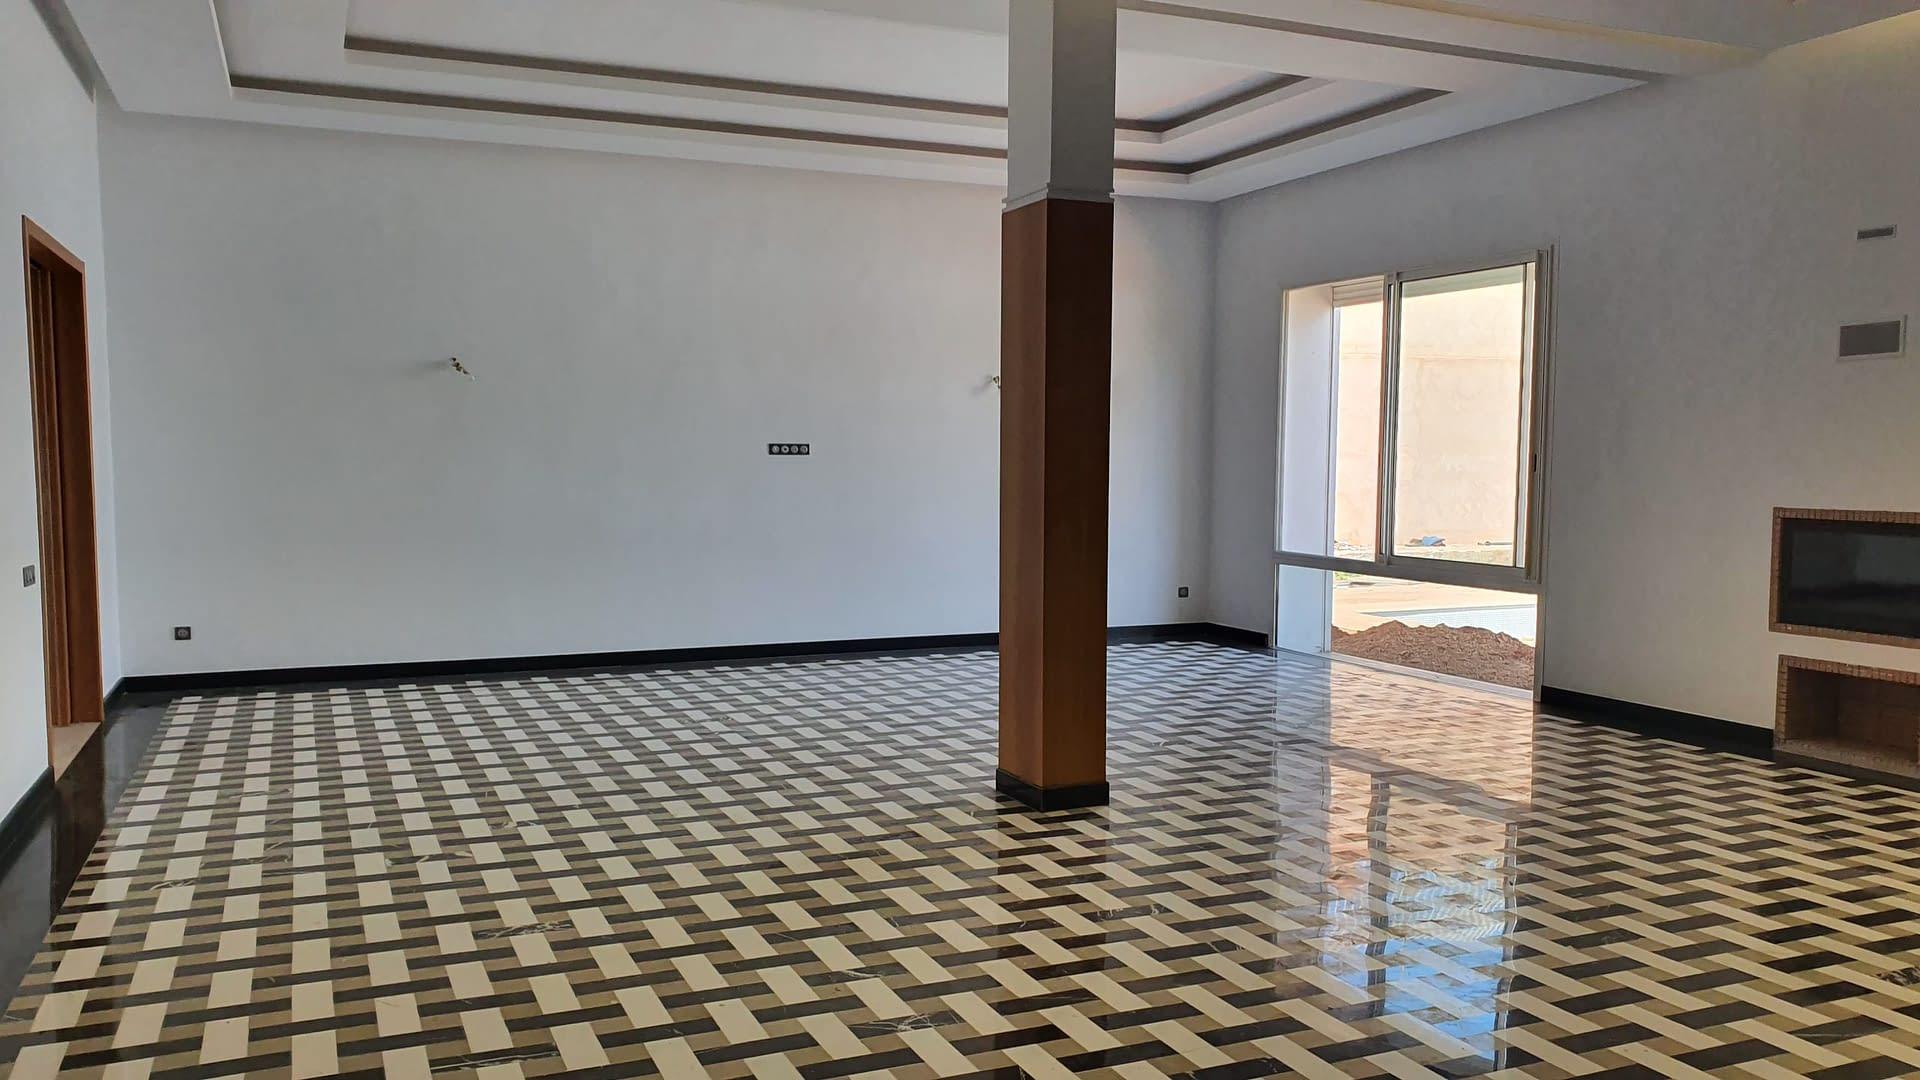 Location villa neuve à Rabat Souissi